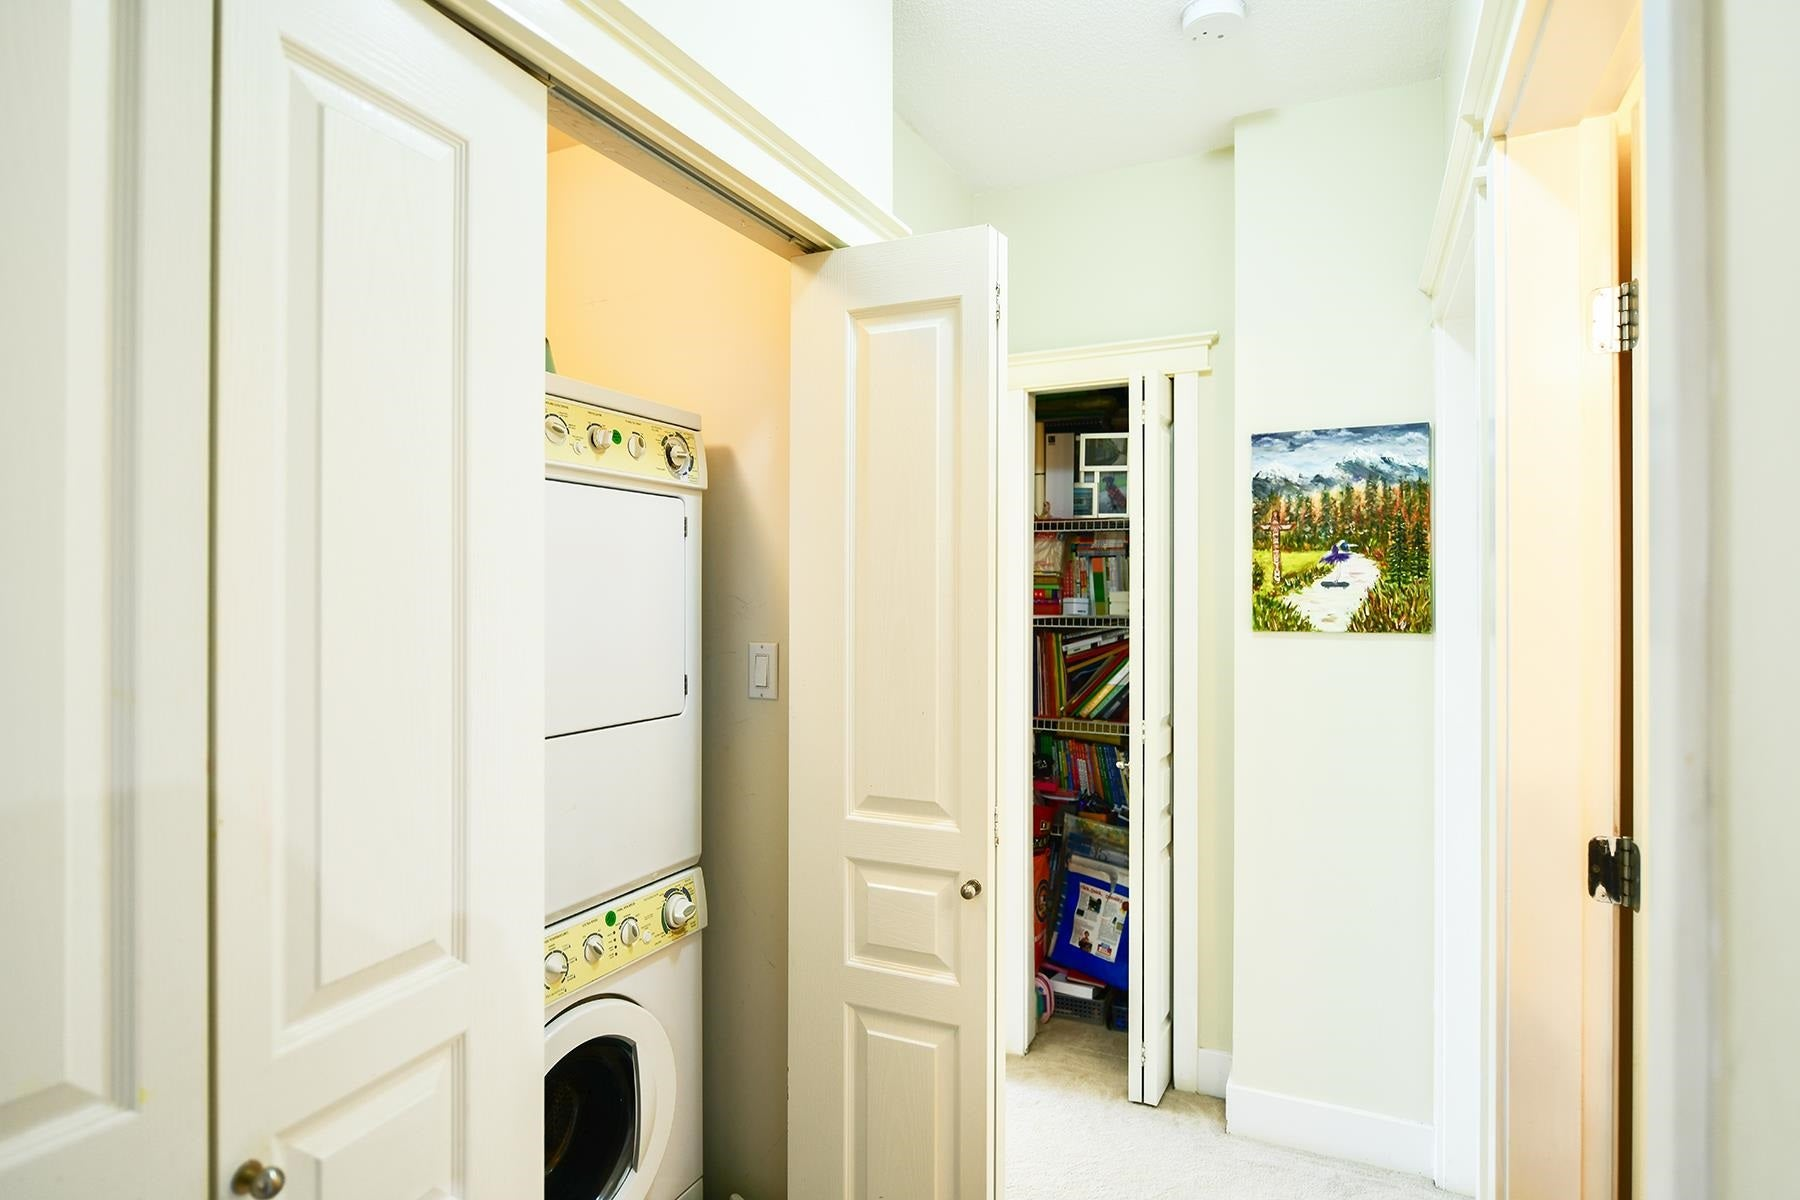 204 5790 EAST BOULEVARD - Kerrisdale Apartment/Condo for sale, 3 Bedrooms (R2604138) - #21